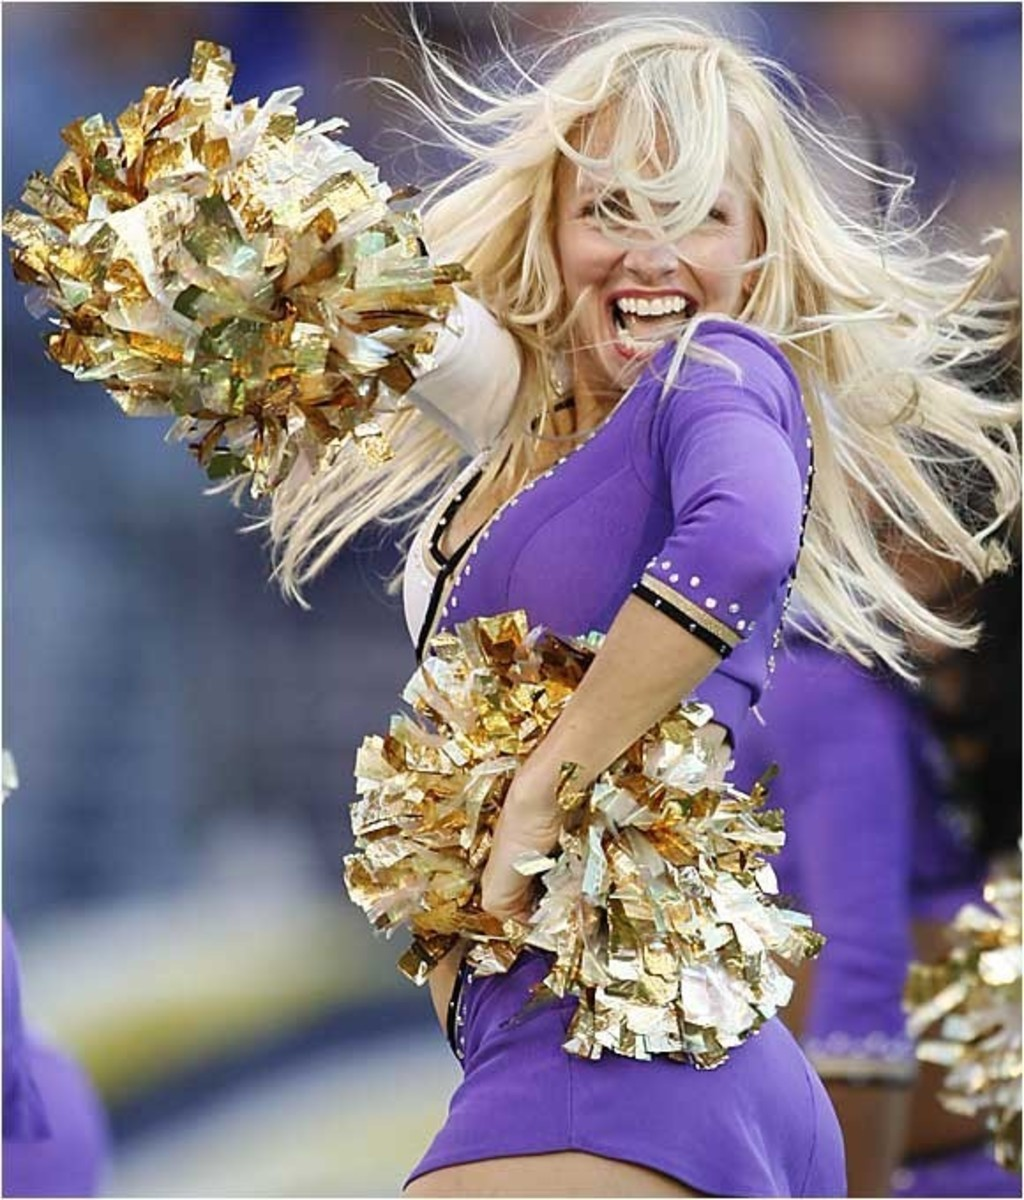 The cheerleader - Raw Energy and Razzamatazz!